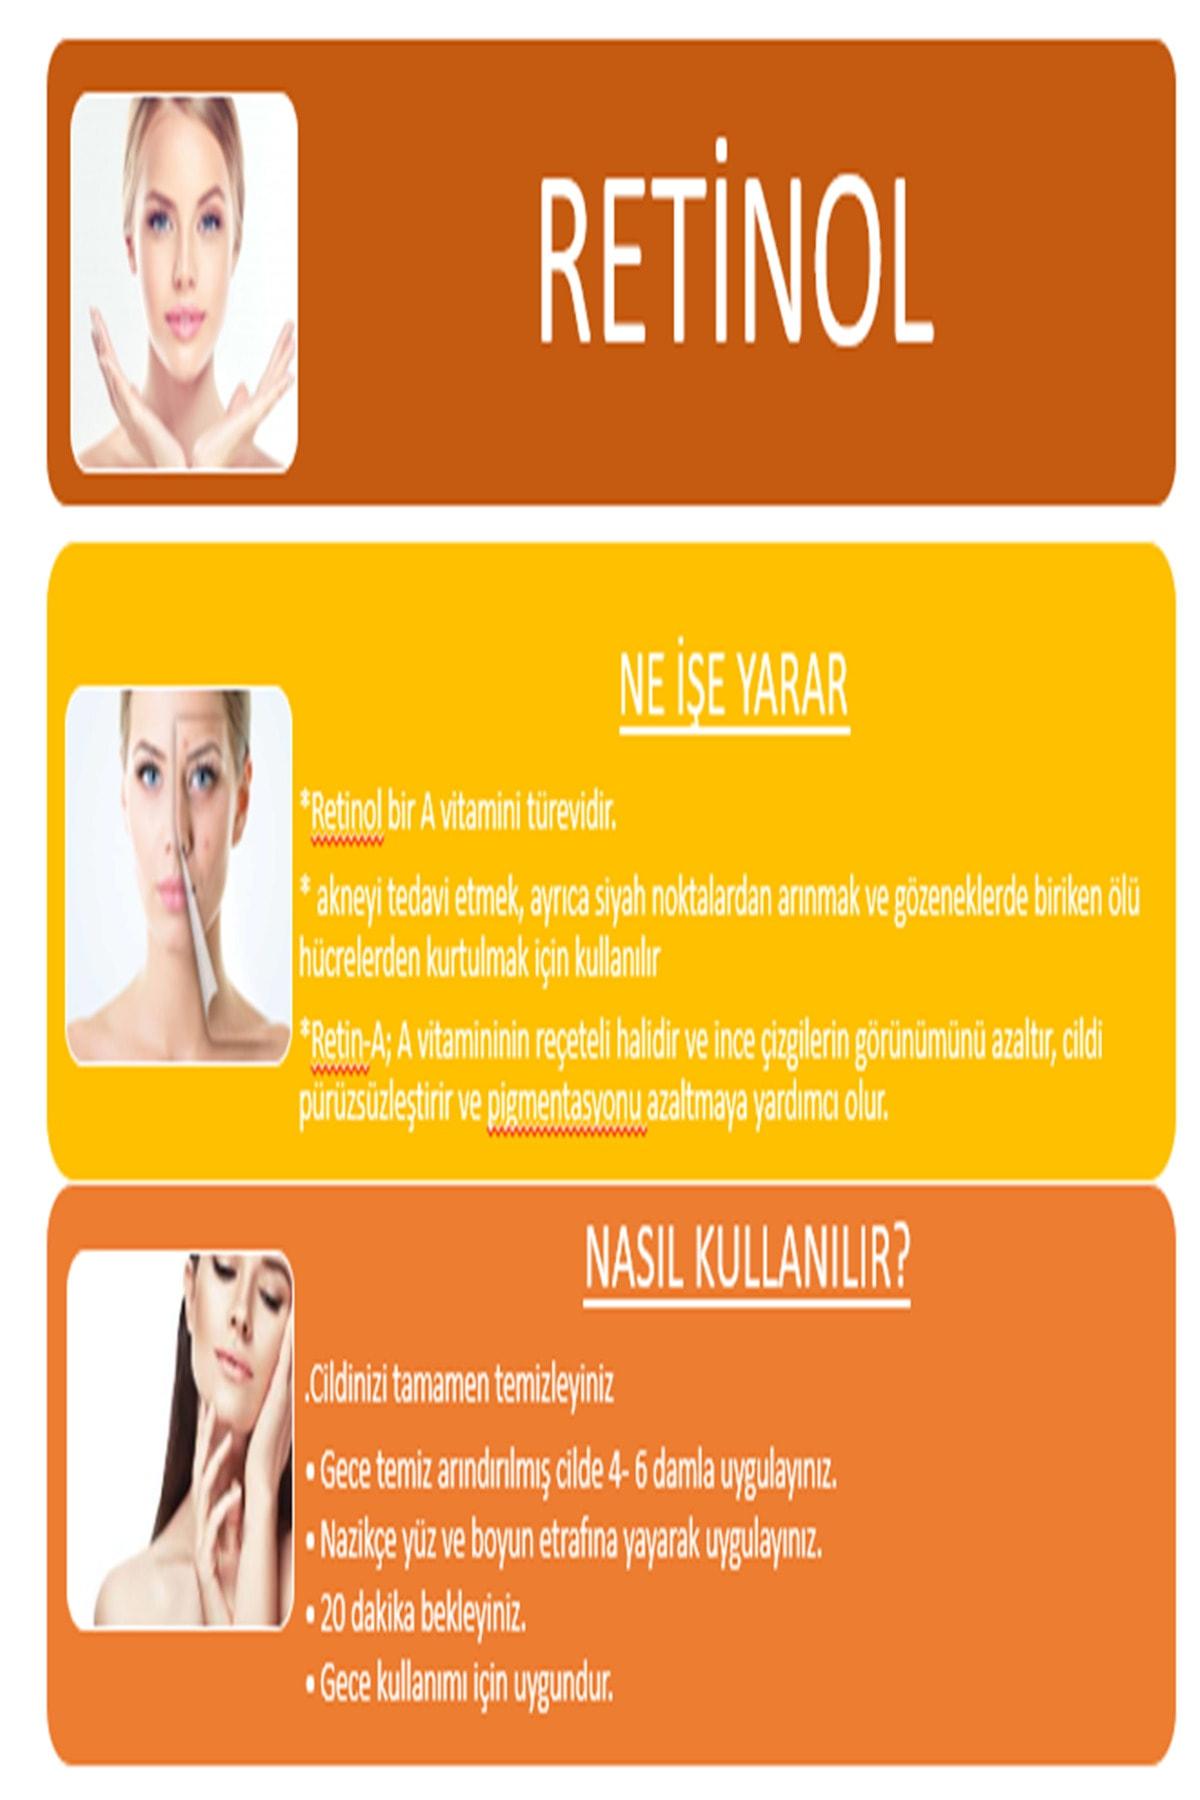 Pure Somon Dna Hyaluronic Acid Retinol Vitamin C Yüz Temizleme Toniği 2